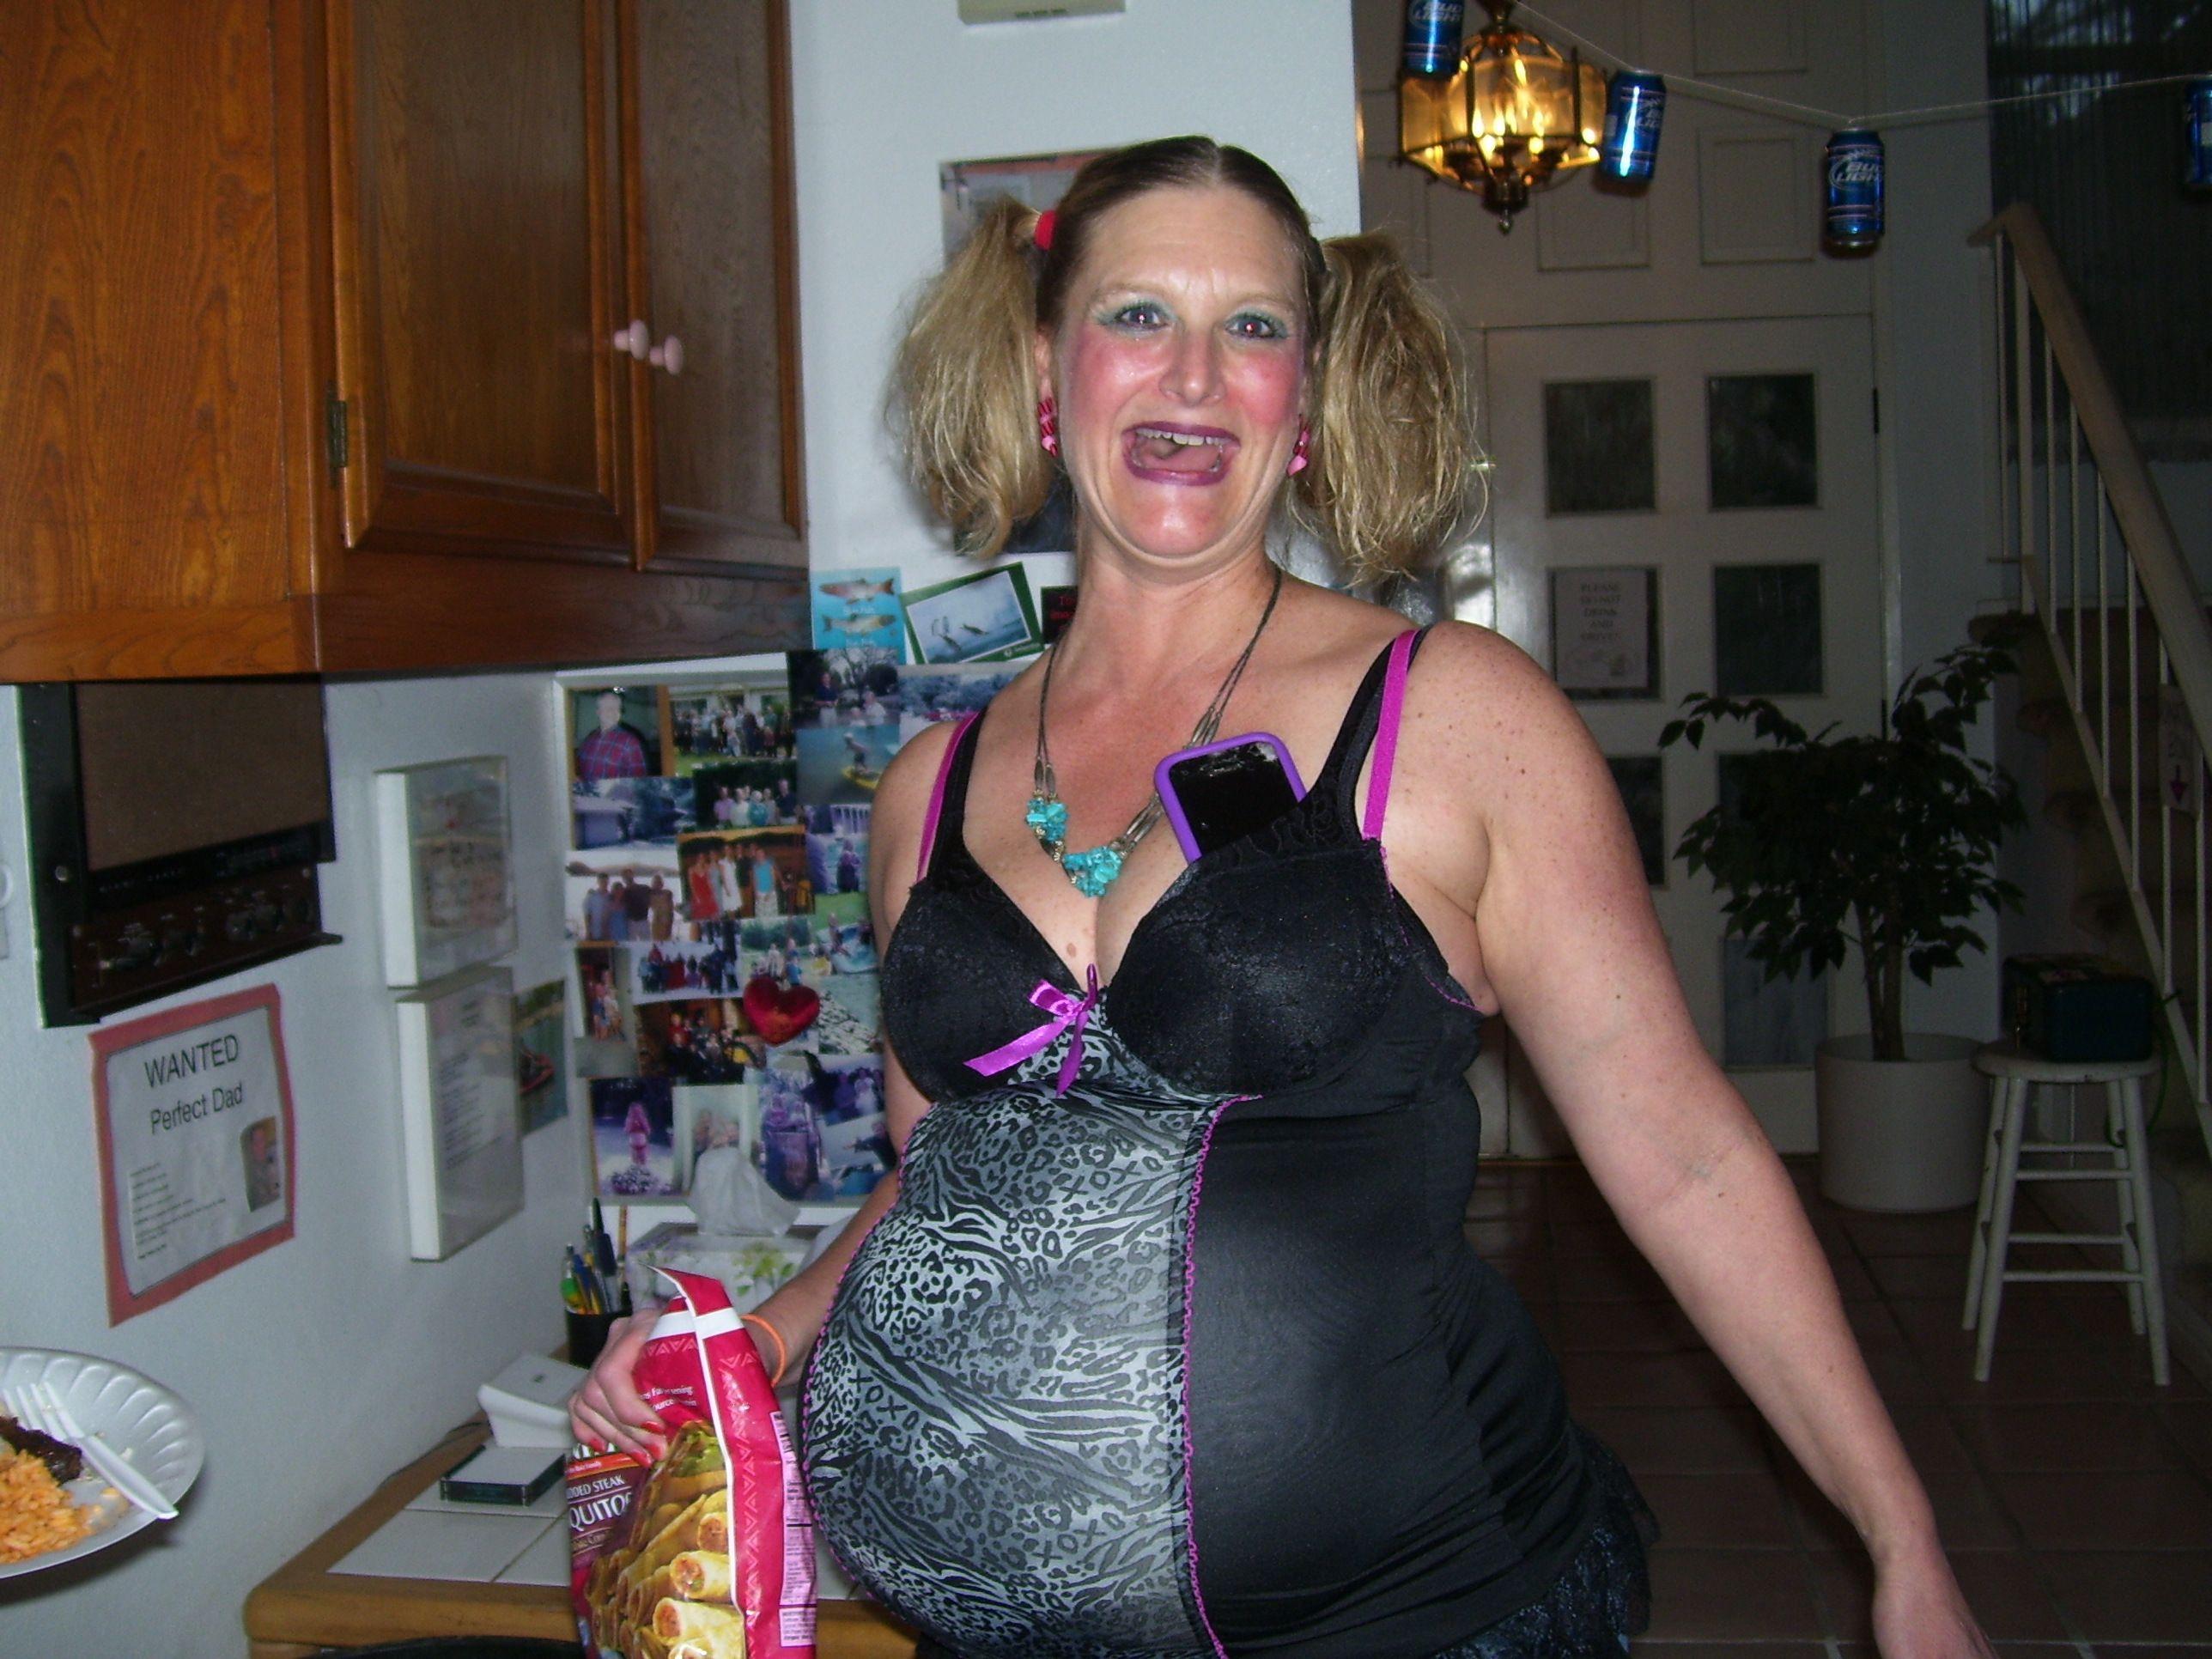 trashy fat redneck women